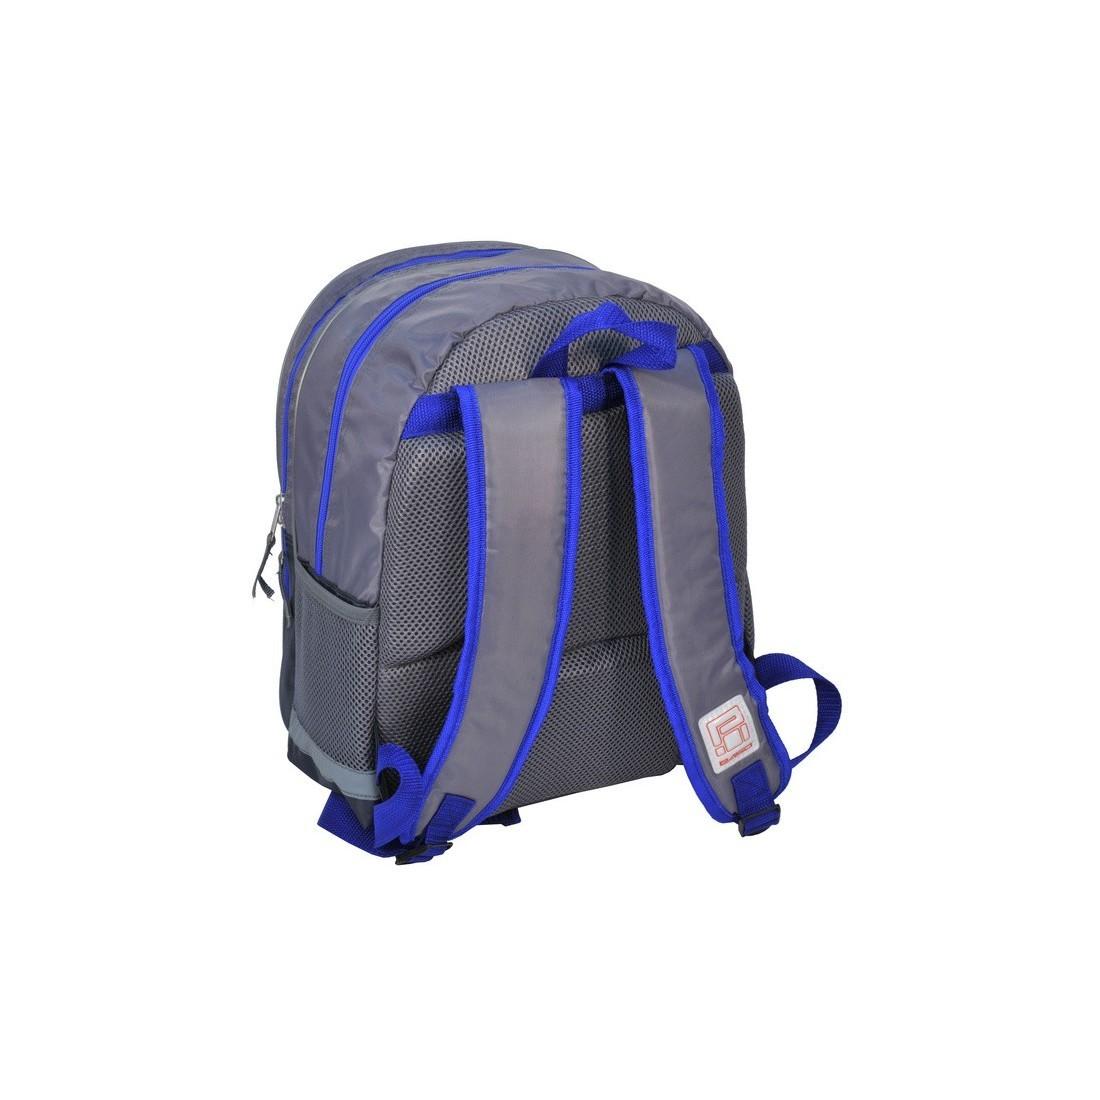 Plecak szkolny granatowy z autem Mustang - plecak-tornister.pl